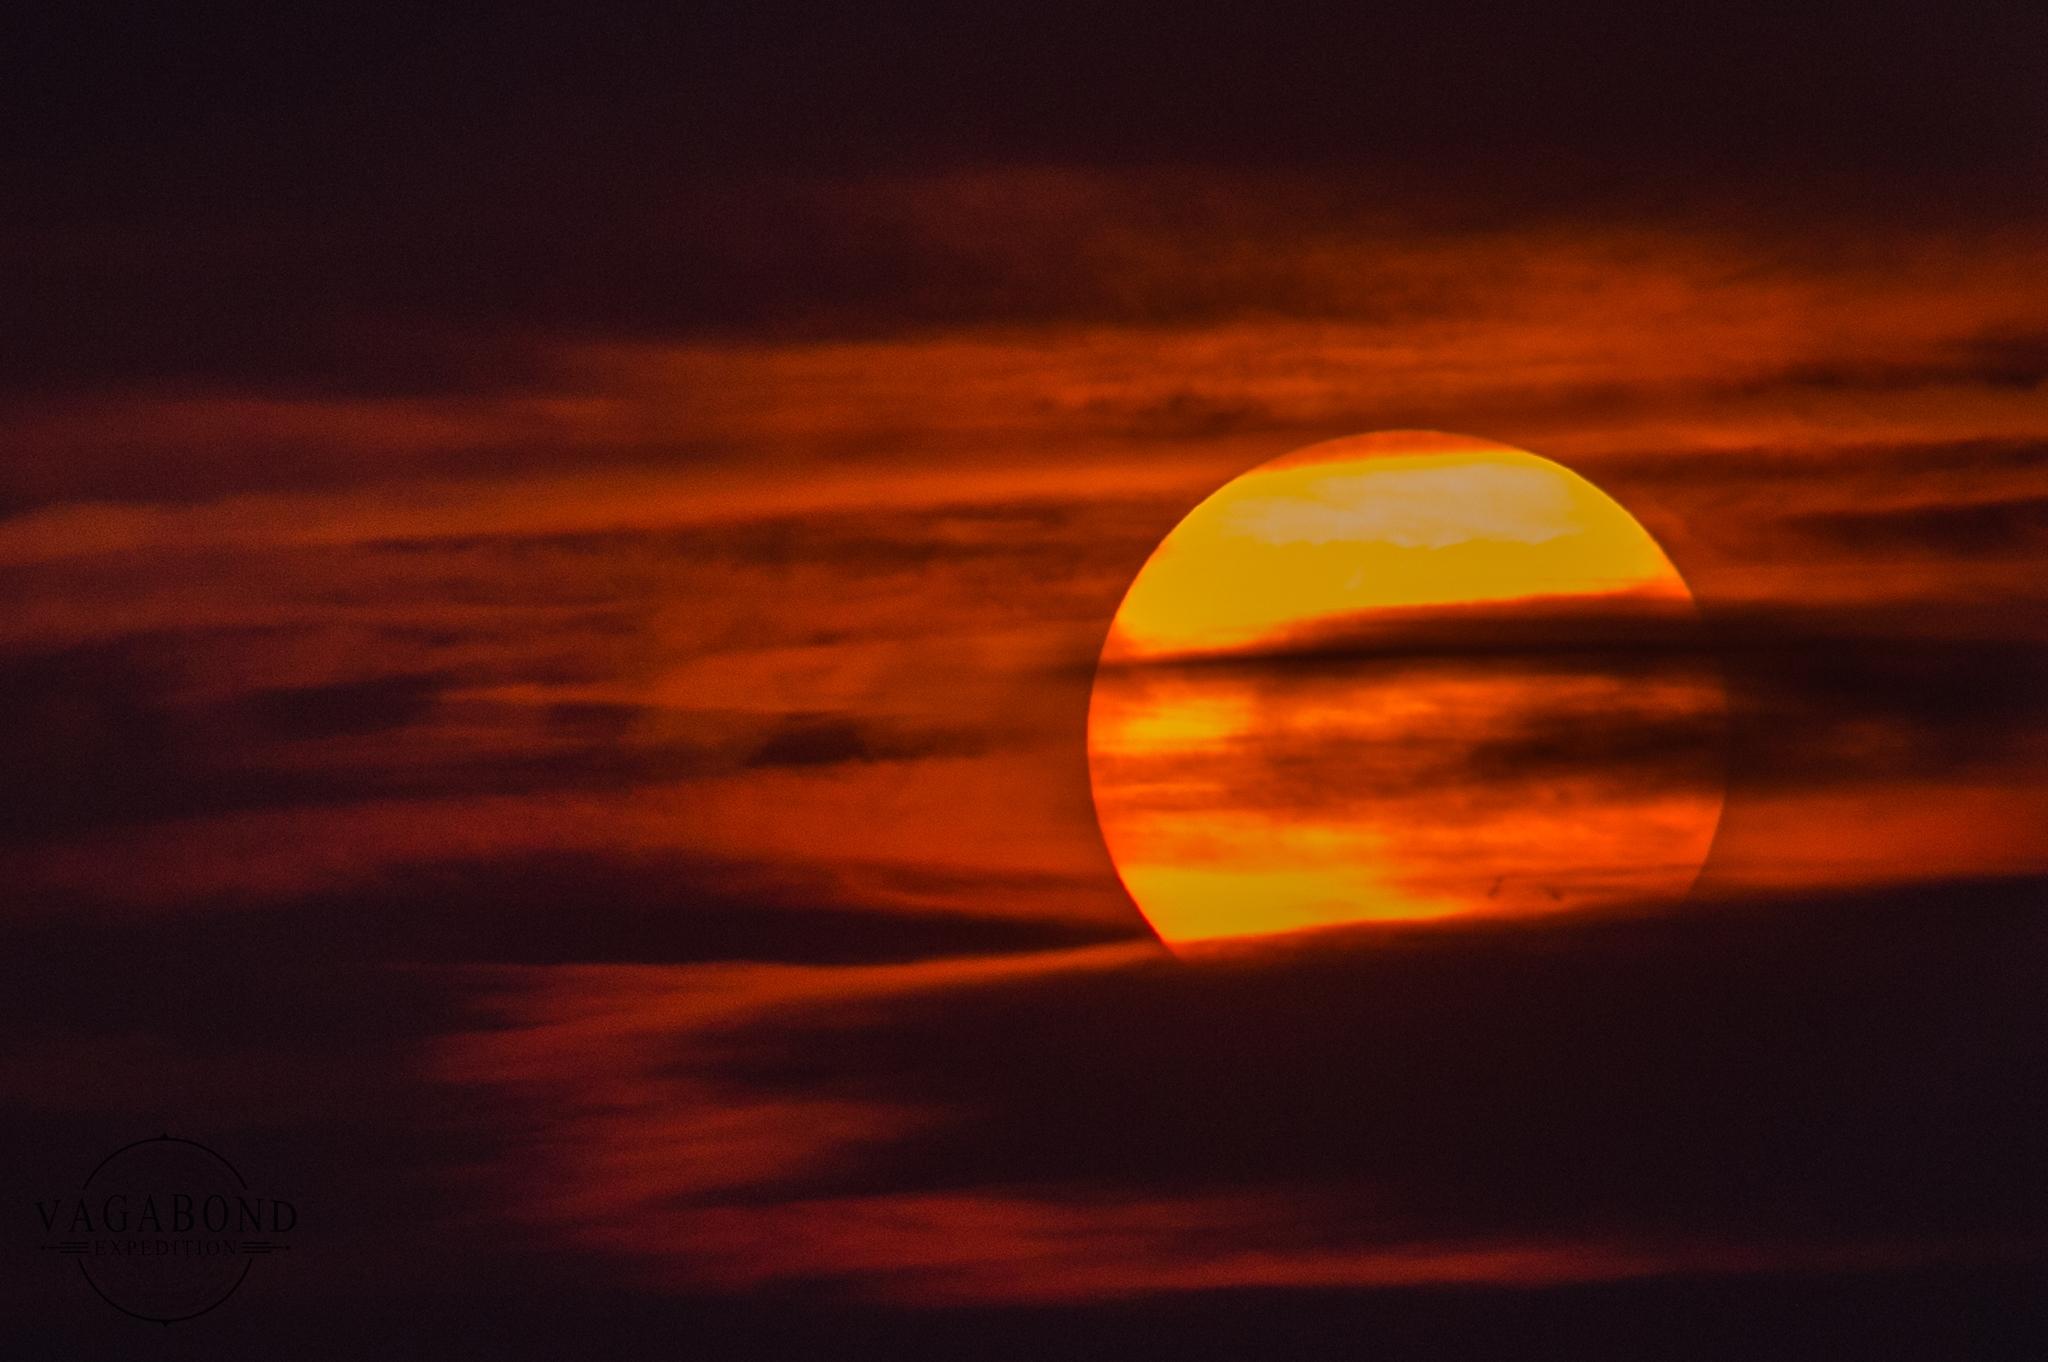 Sun Spot 2403